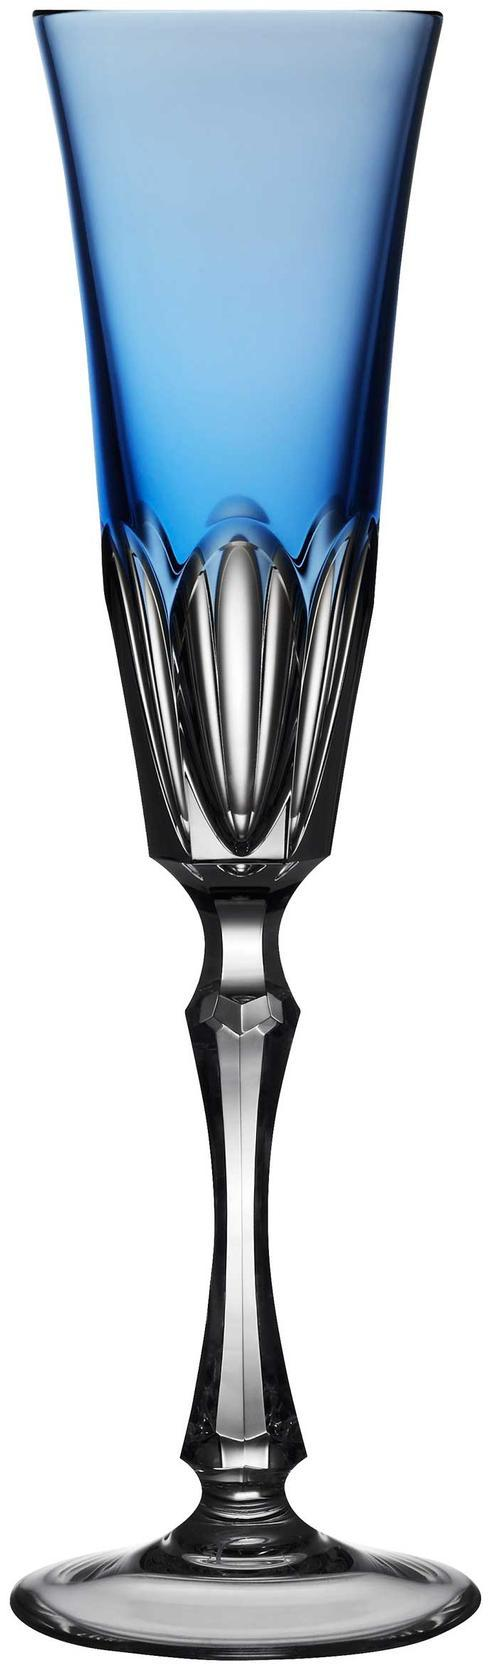 $198.00 Sky Blue Champagne Flute